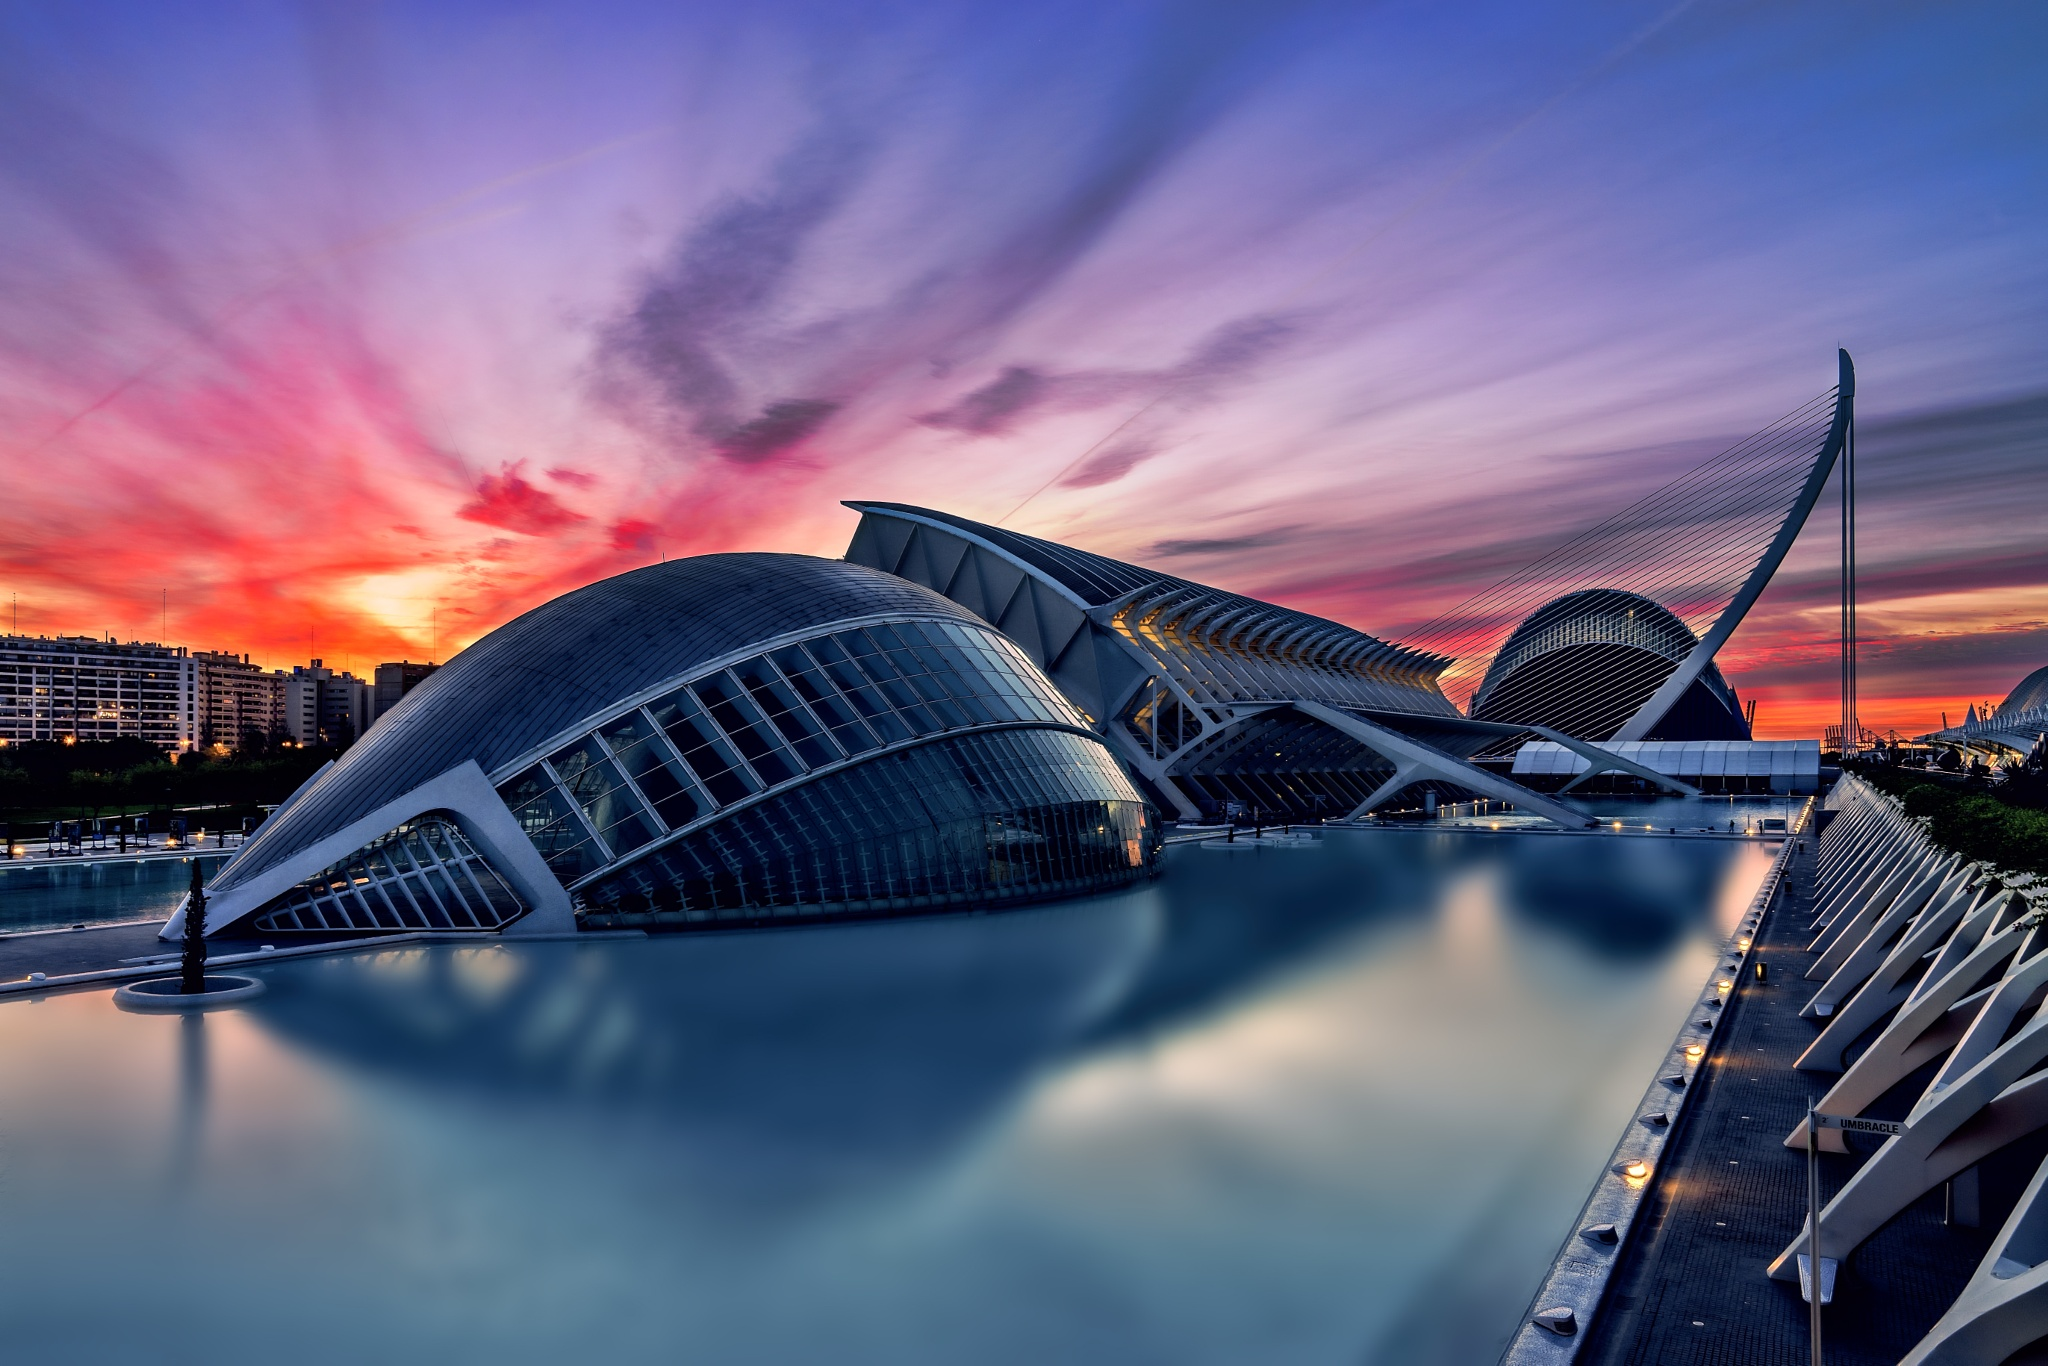 Sunrise at Valencia ... by Cris Martinez